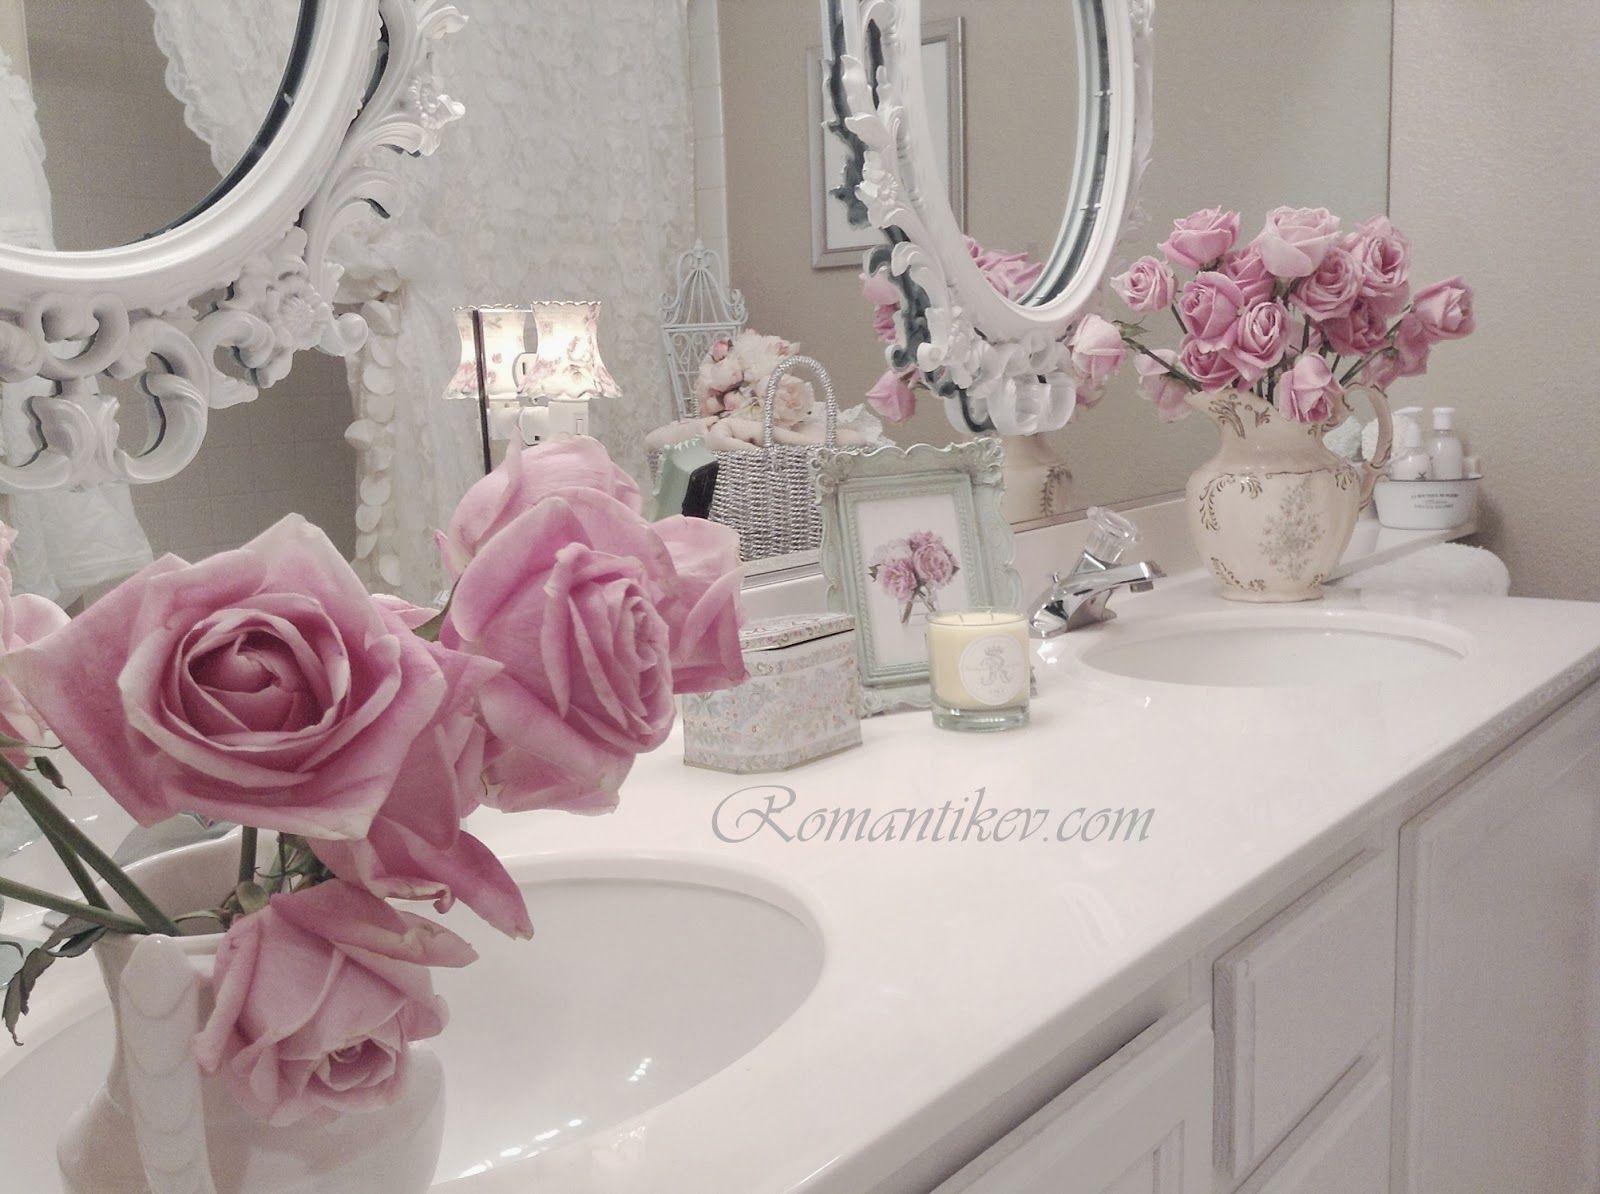 Romantic shabby chic home romantic shabby chic blog - My Shabby Chic Home Romantik Evim Romantik Ev Romantik Ev My Bathroom Shabby Chic Homesromantic